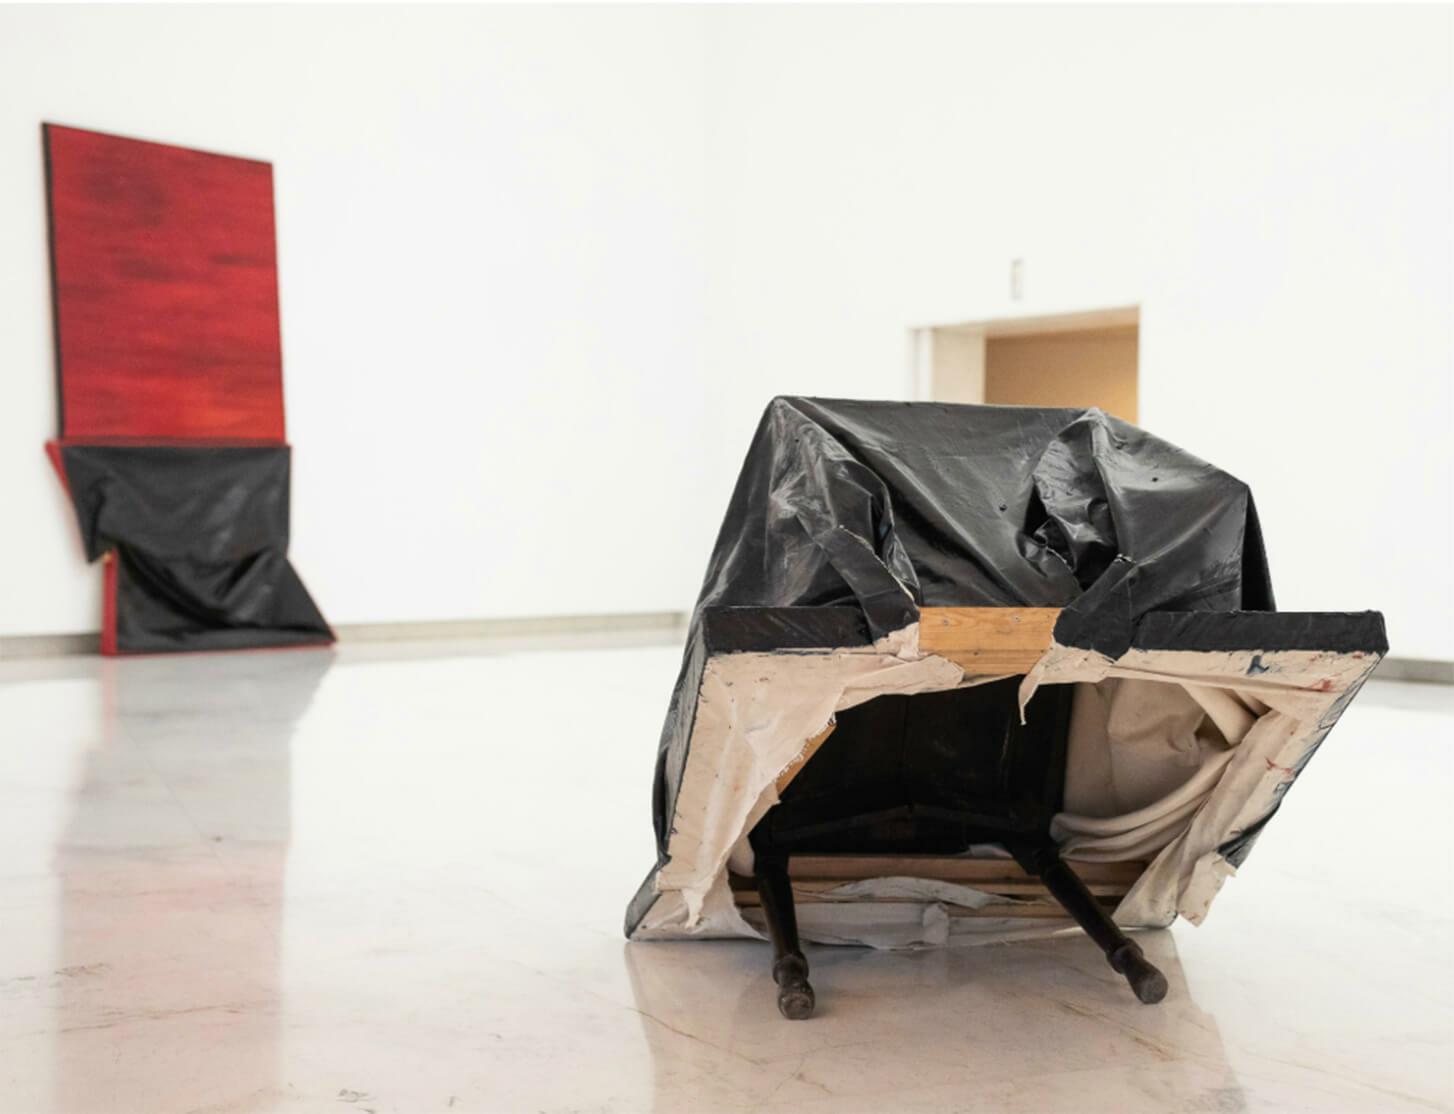 Angela de la Cruz's exhibition 'Homeless' travels to Santiago